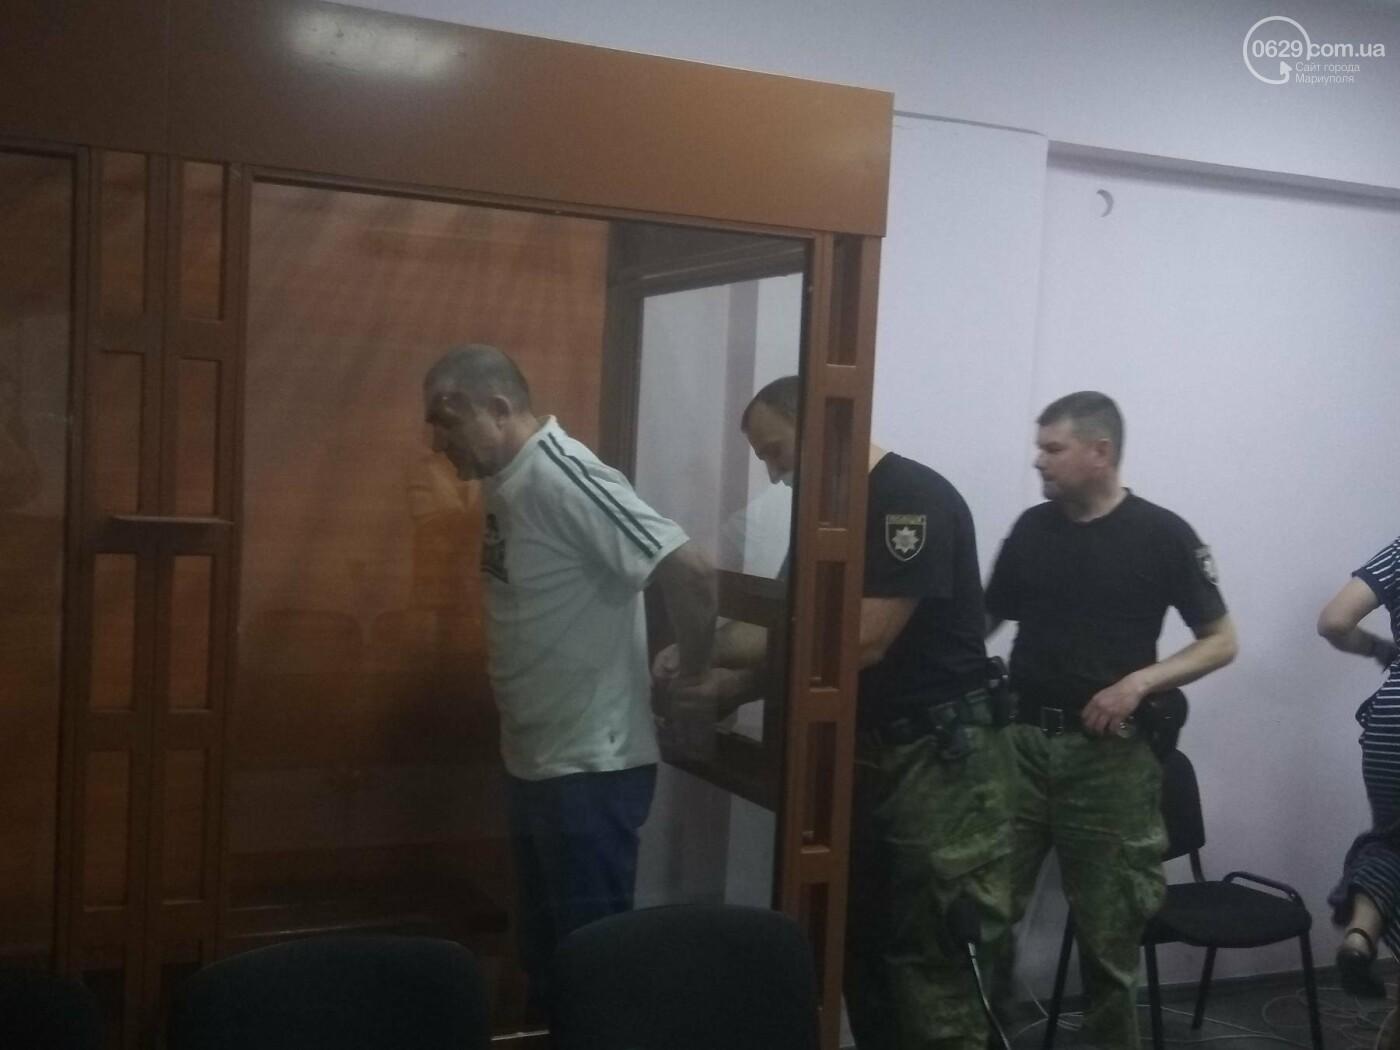 Суд над Кирсановым: подсудимый радовался захвату ДАПа и обсуждал «Смерчи», - ФОТО, ВИДЕО, фото-1